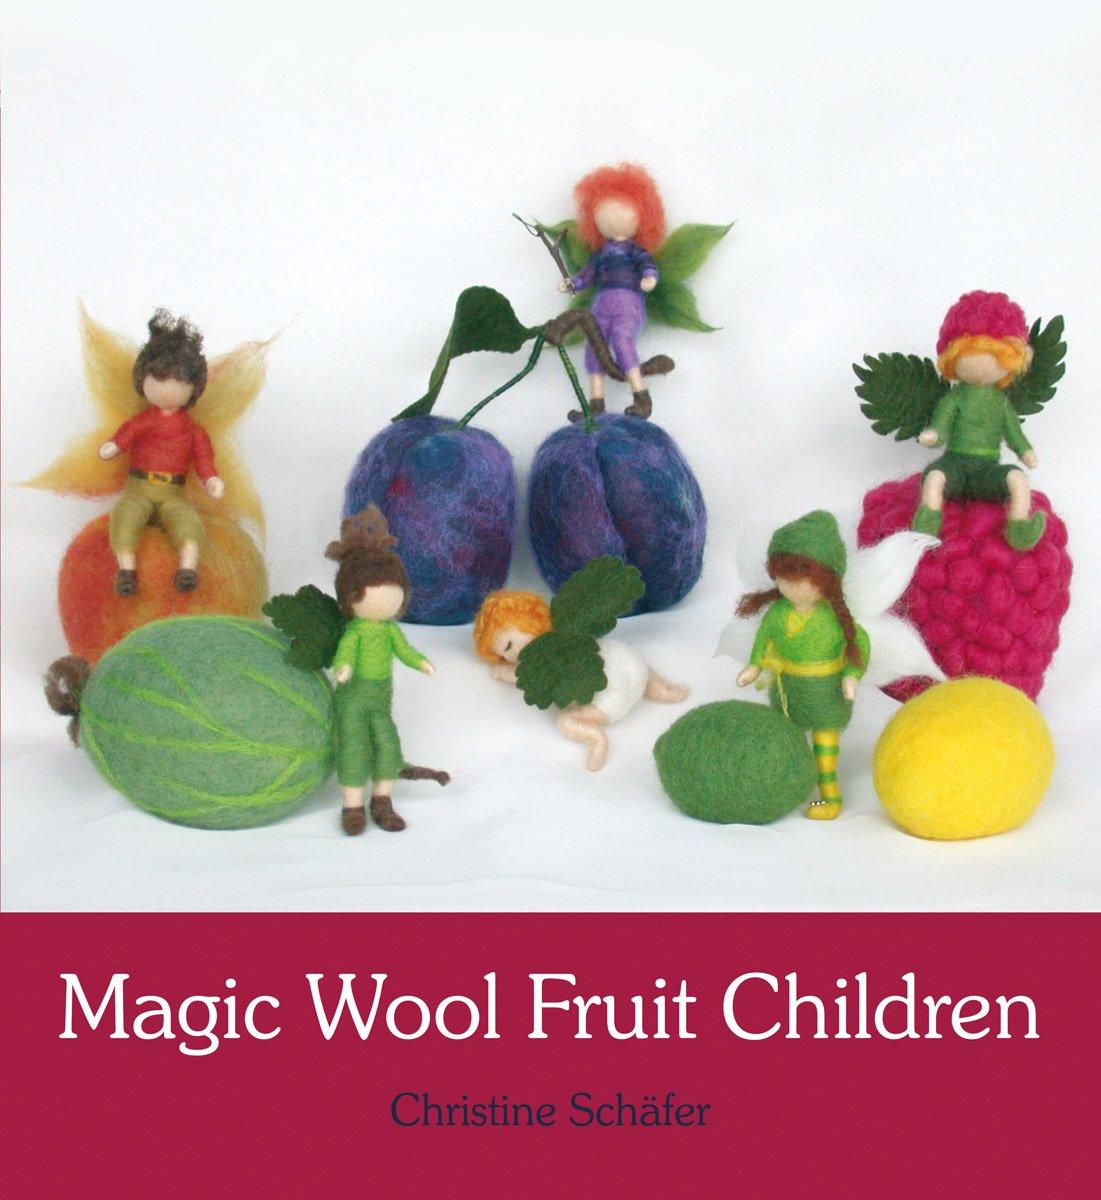 magic-wool-fruit-children.jpg